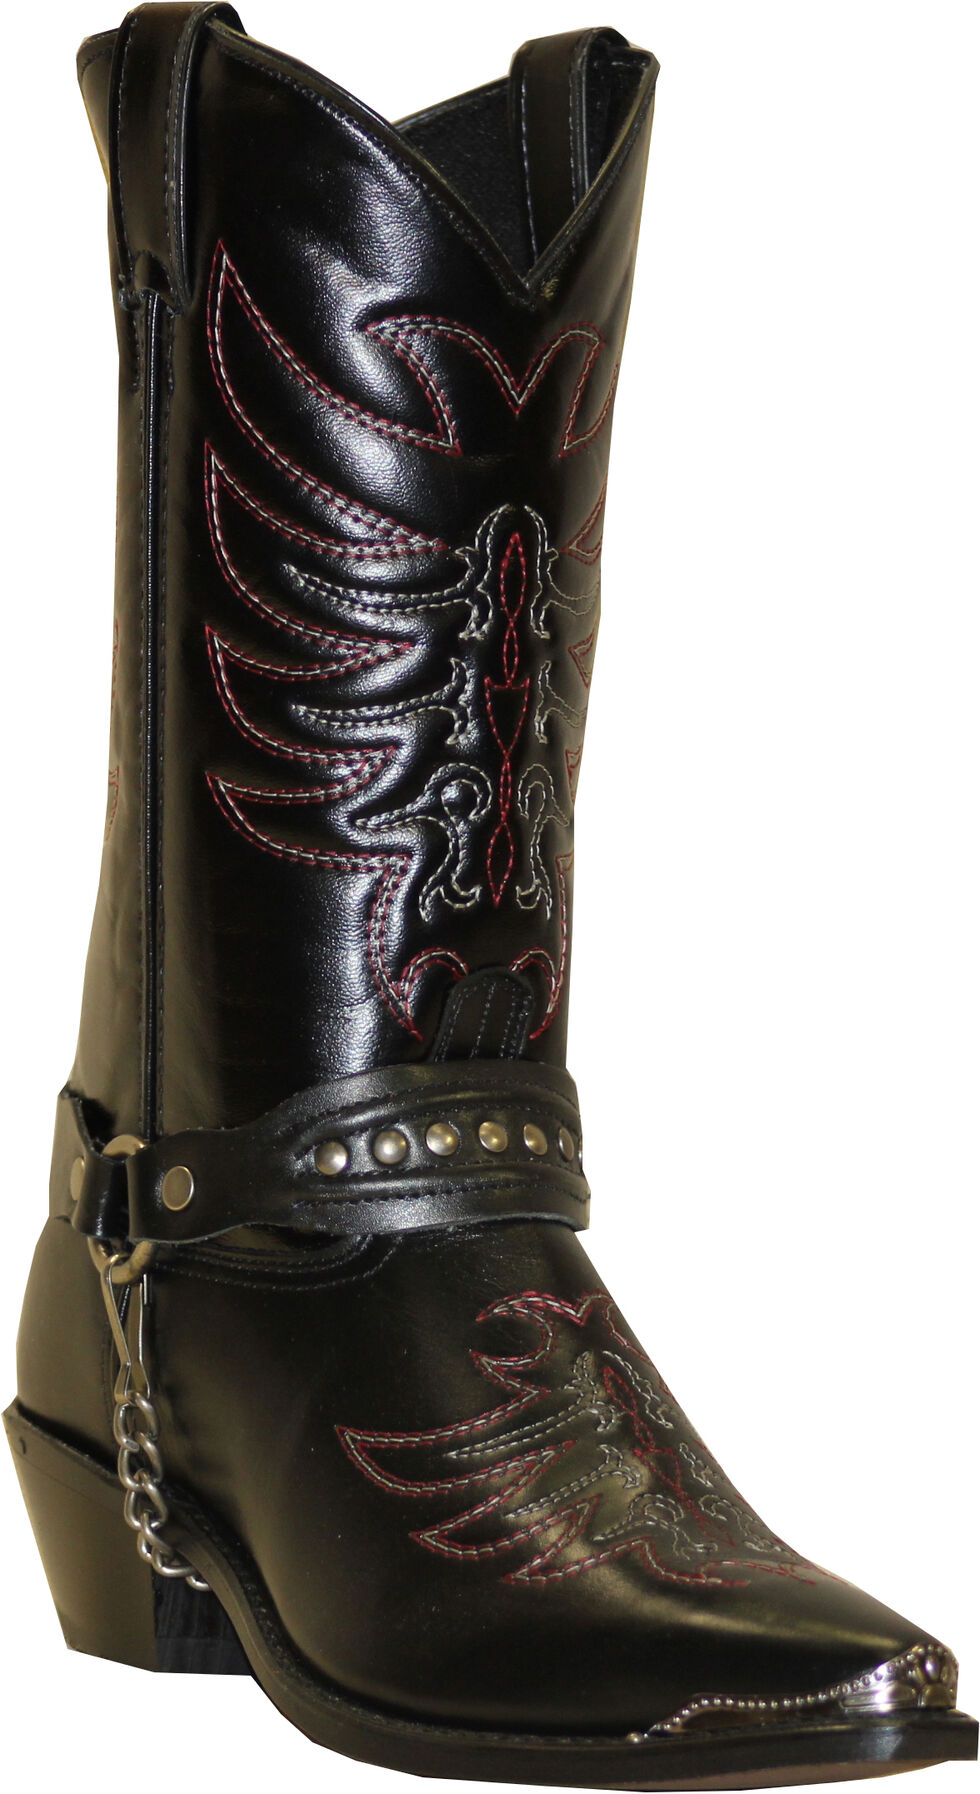 Sage by Abilene Boots Men's Scorpion Harness Boots, Black, hi-res